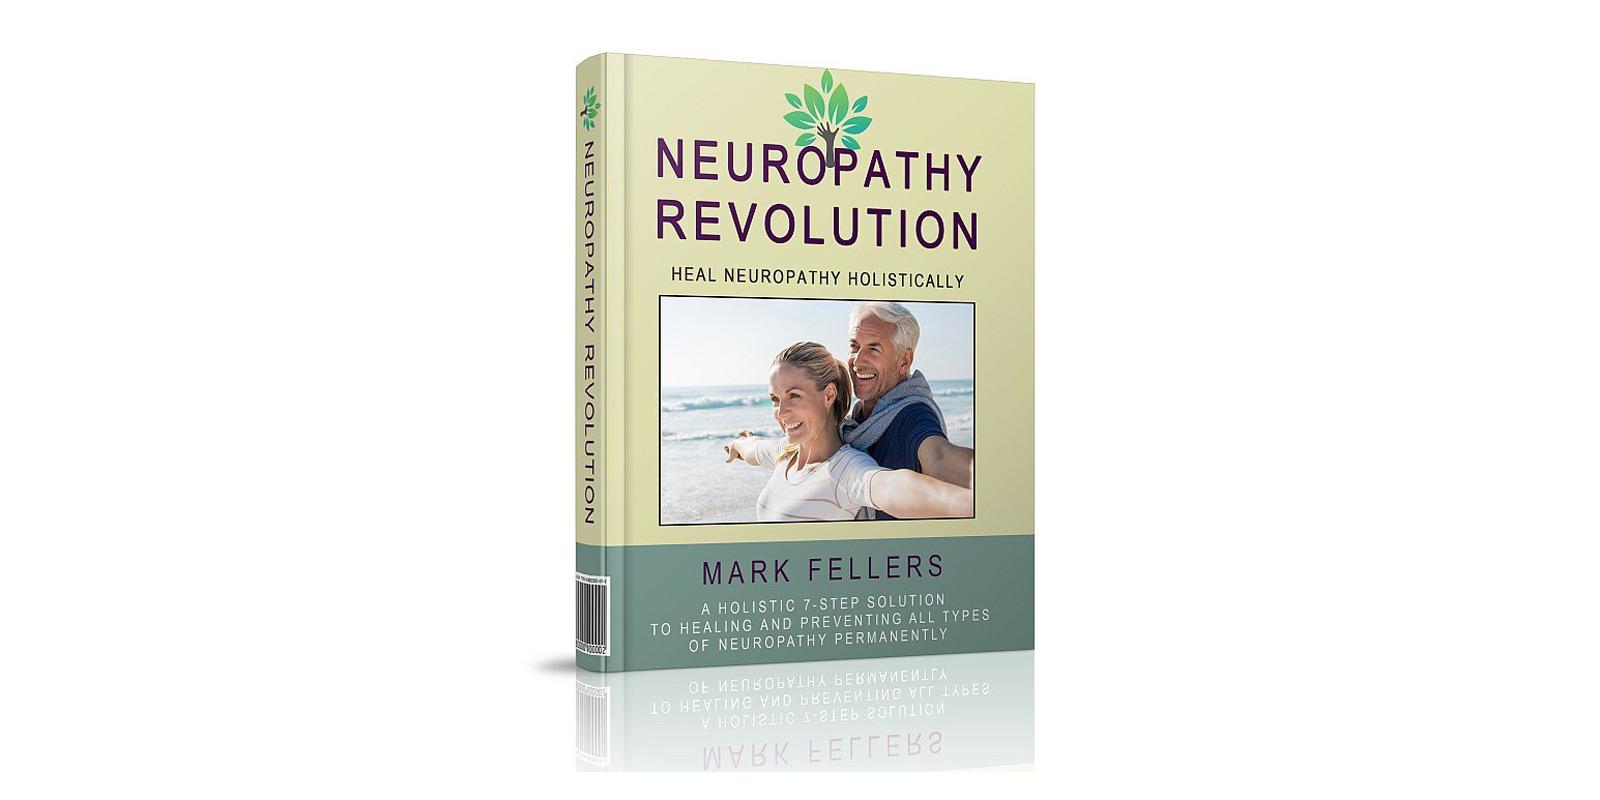 Neuropathy Revolution reviews